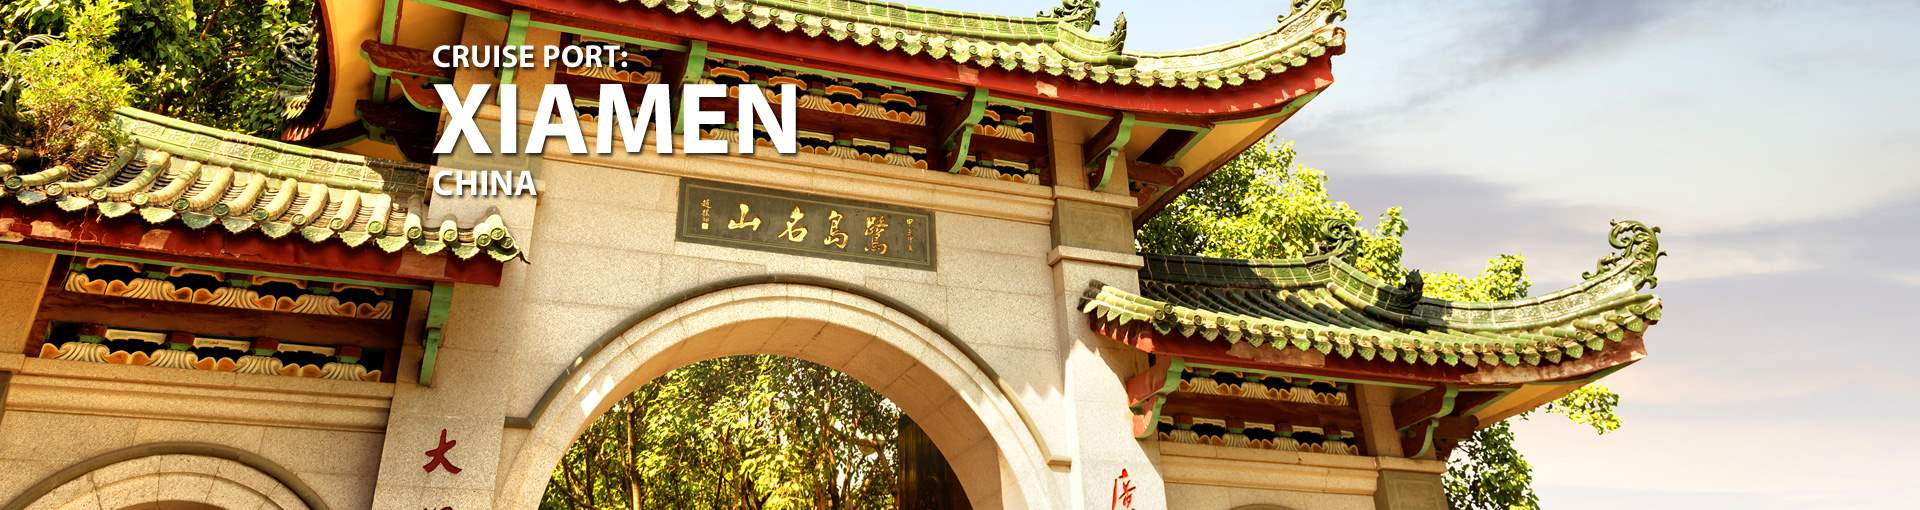 Cruises to Xiamen, China